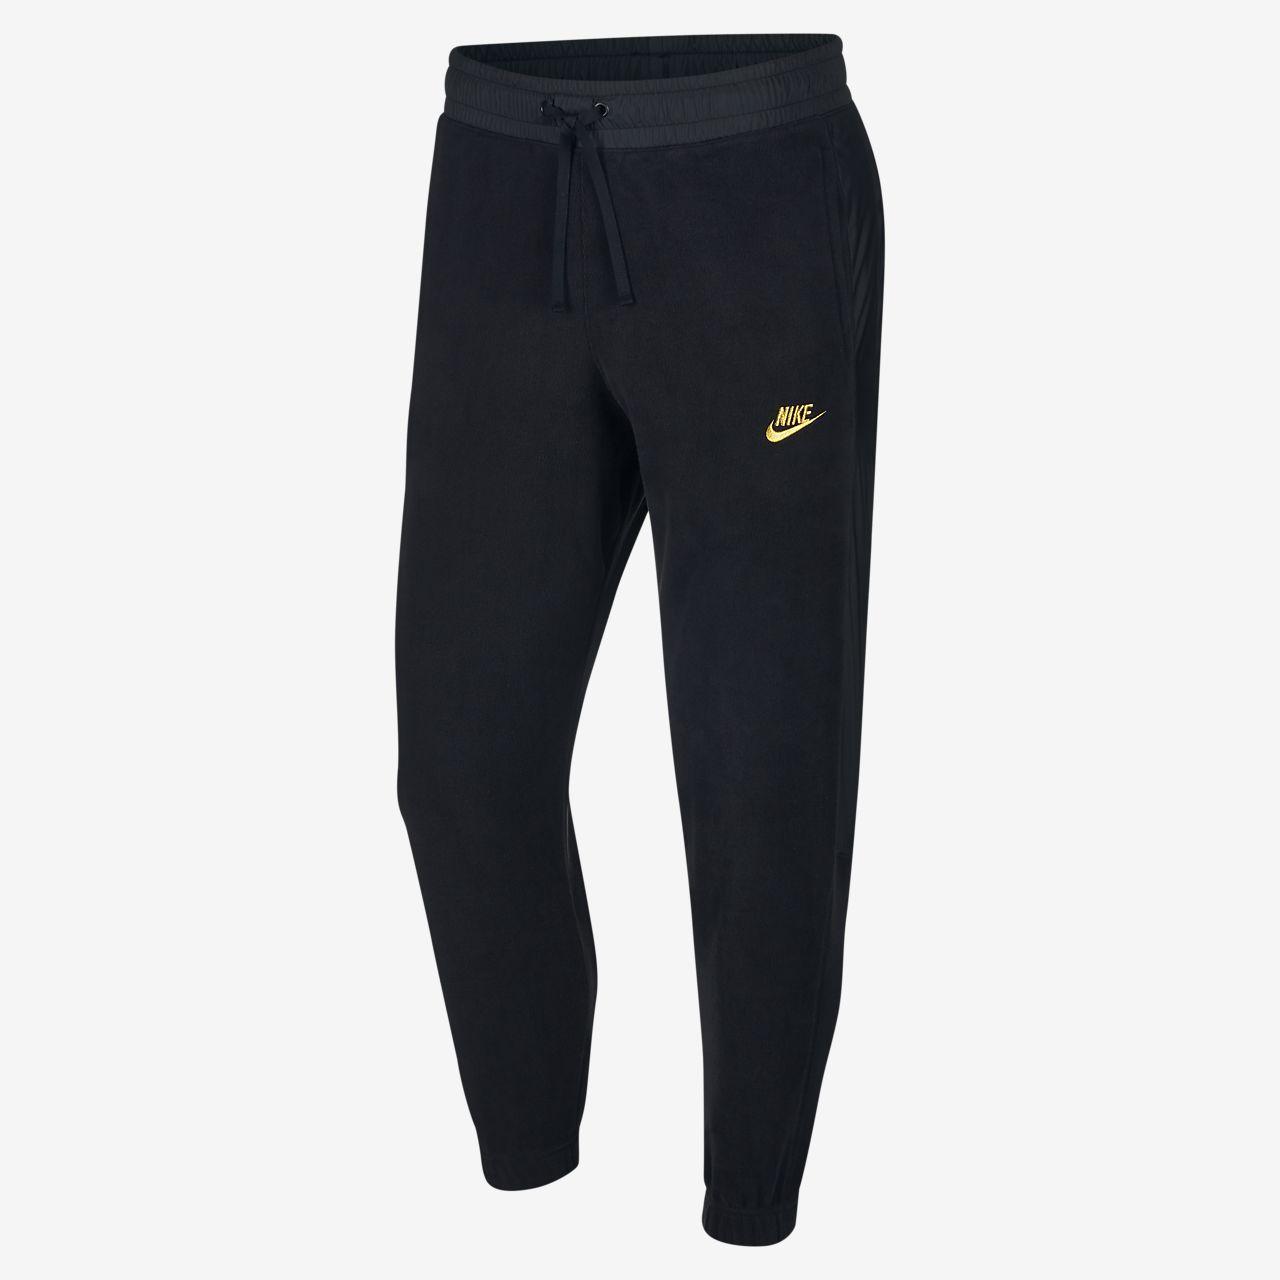 Nike Sportswear 男子起绒长裤